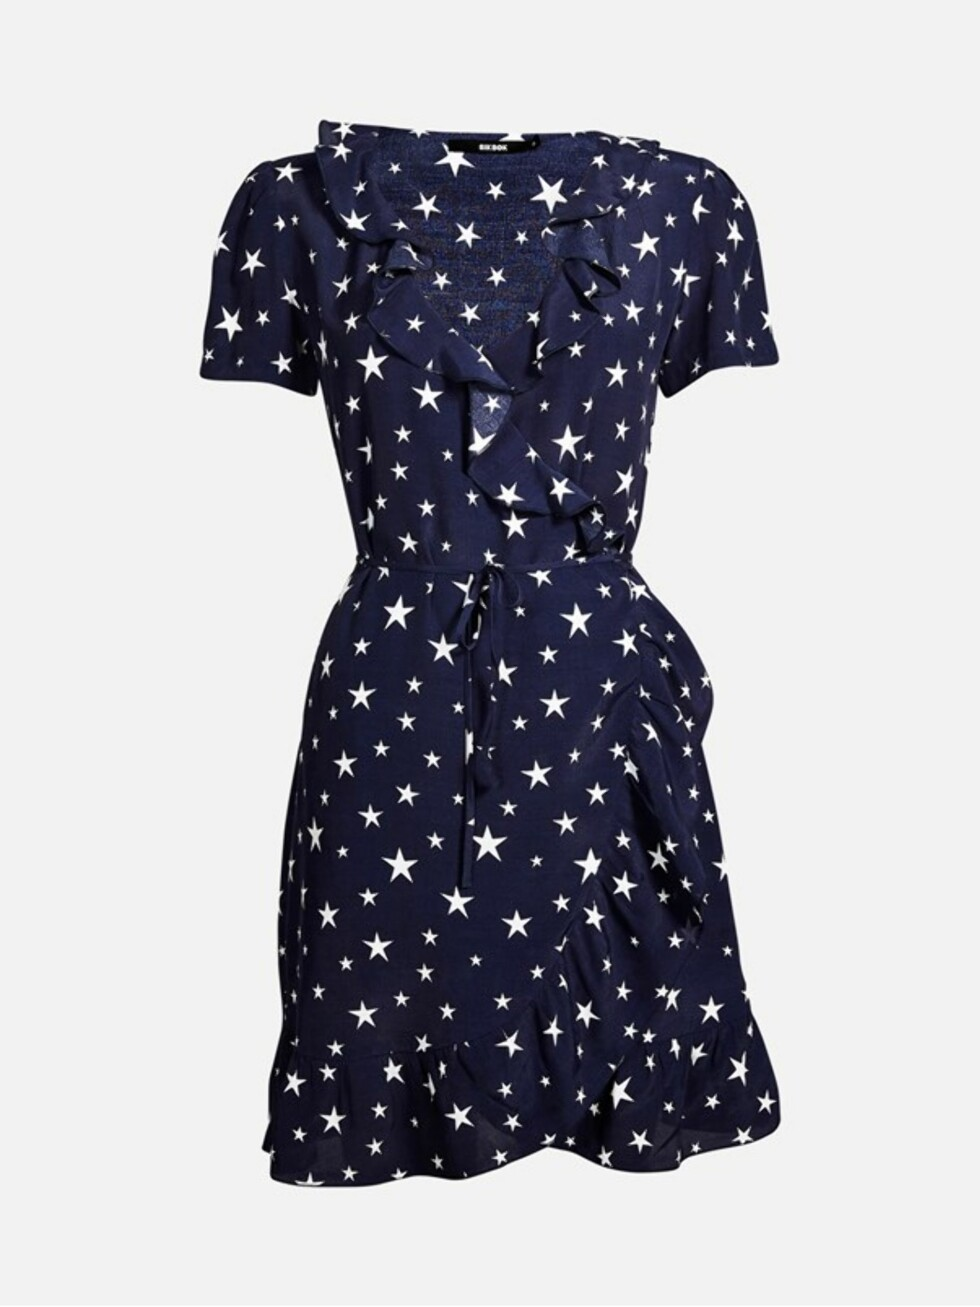 Kjole fra Bik Bok | kr 349 | https://bikbok.com/no/dresses/minty-dress/7202570_F002